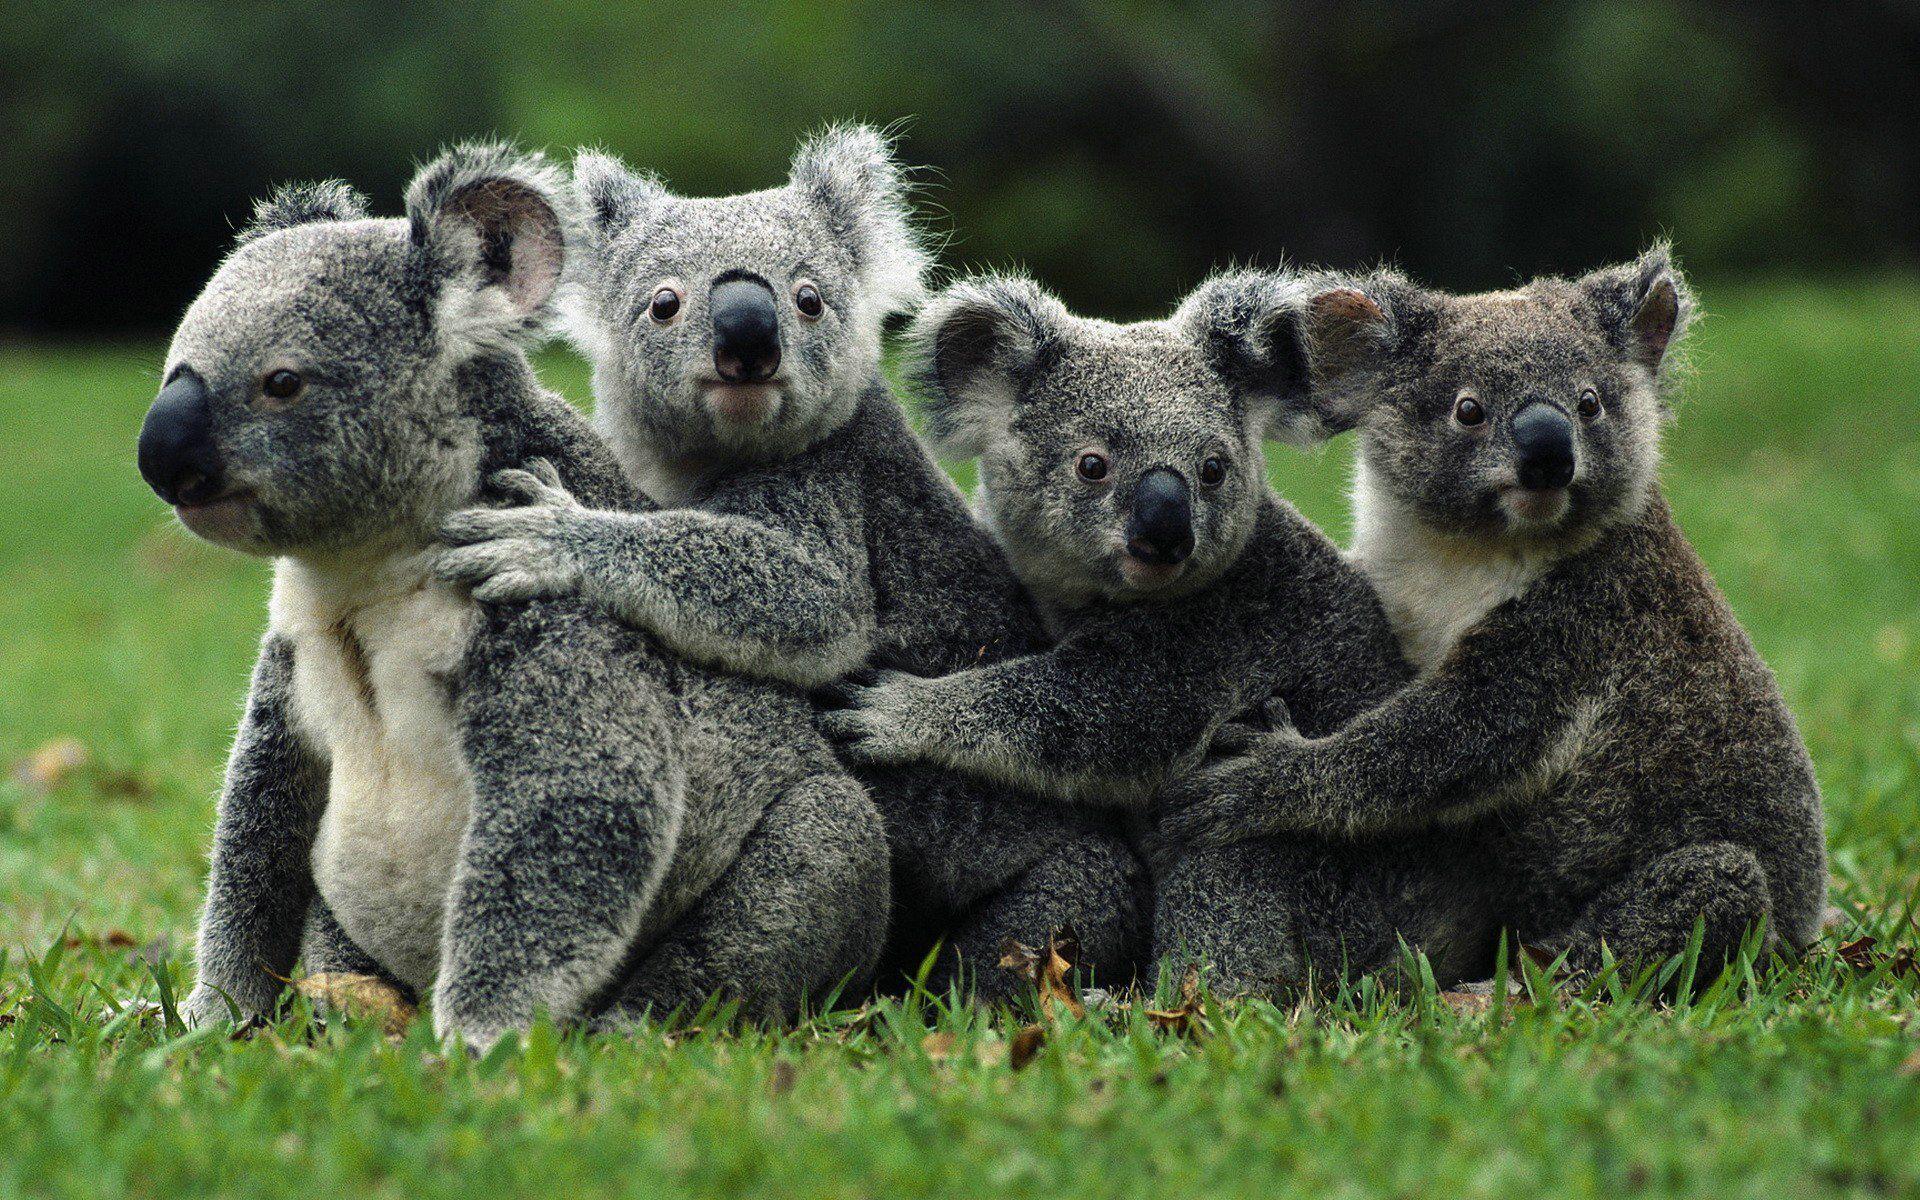 Koala Wallpapers And Backgrounds